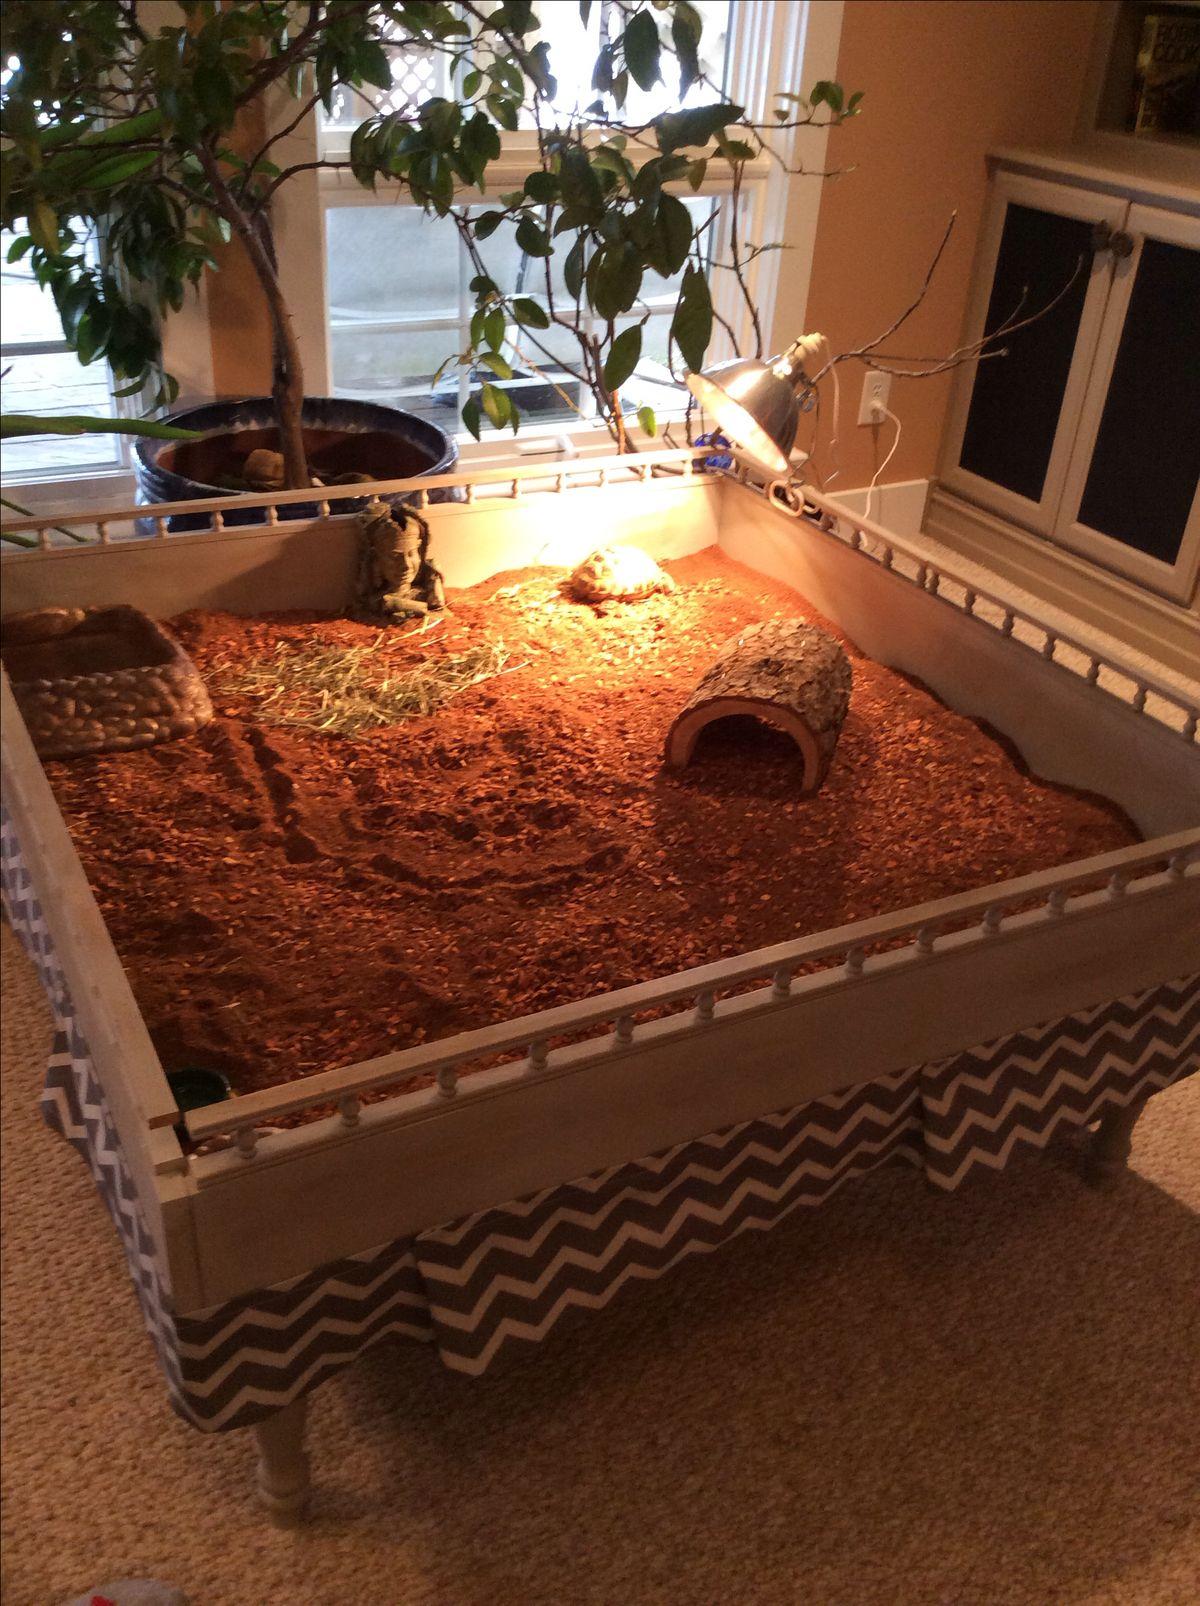 1000 images about tortoise habitats on pinterest for Tortoise table org uk